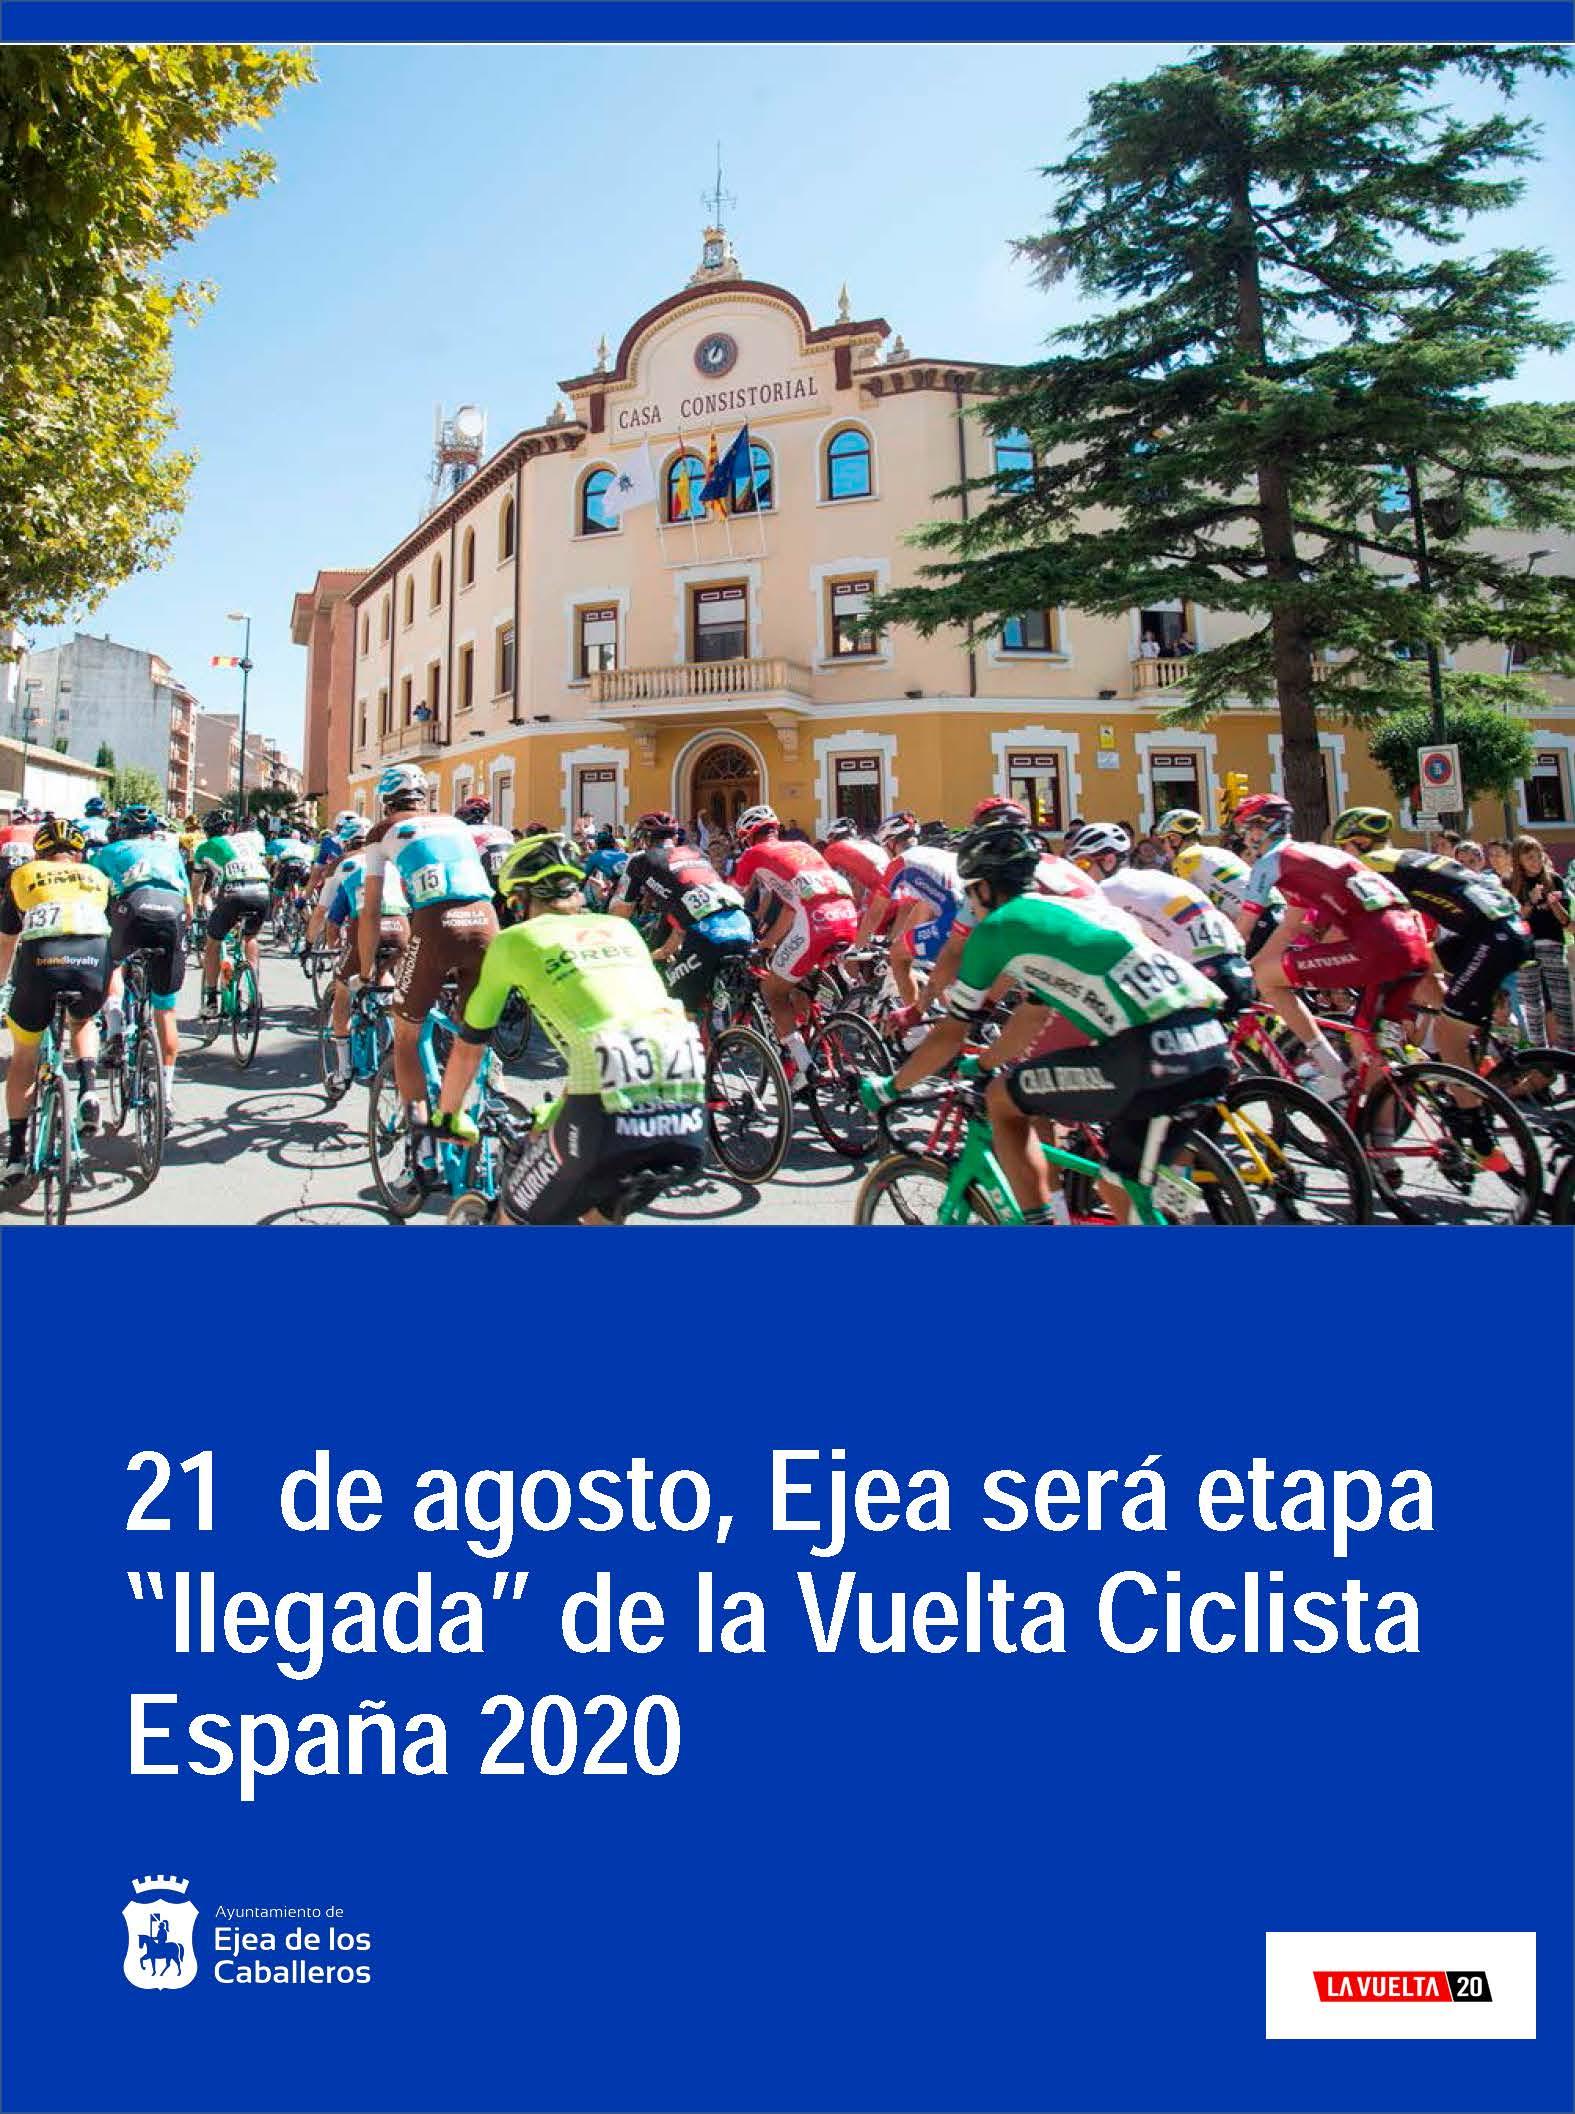 Ejea será etapa de «llegada» de la Vuelta Ciclista a España 2020